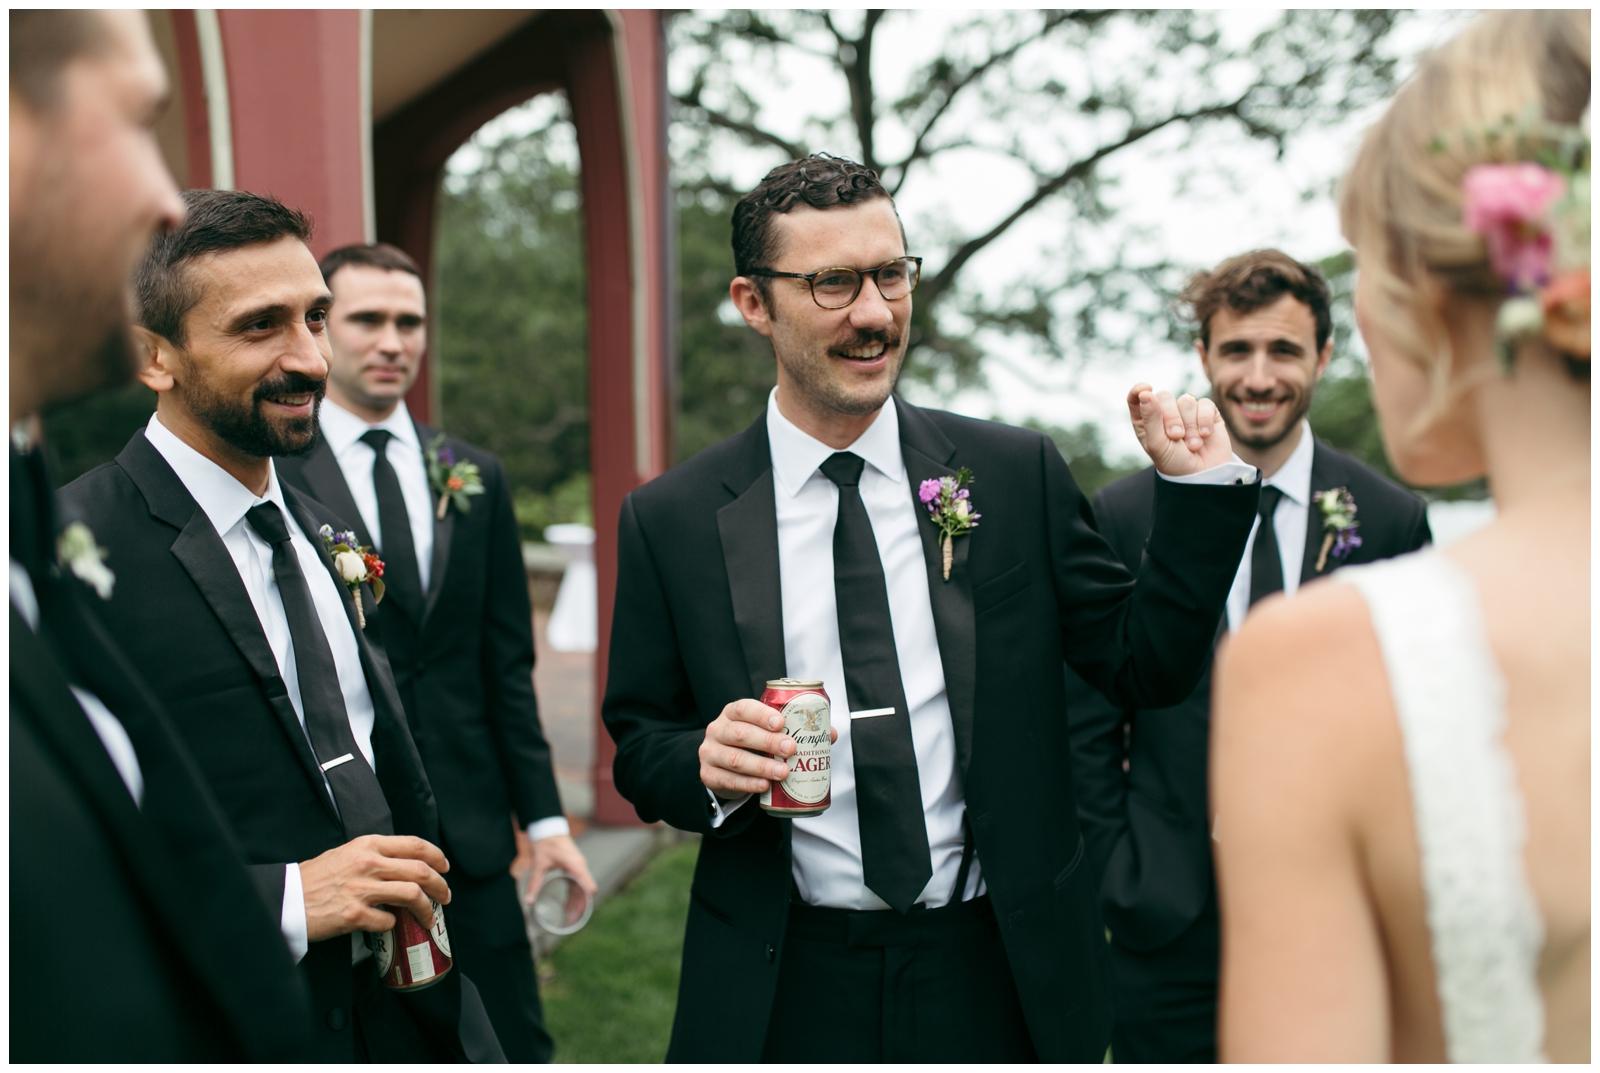 Moraine-Farm-wedding-Bailey-Q-Photo-Massachusetts-wedding-photpgrapher-084.jpg